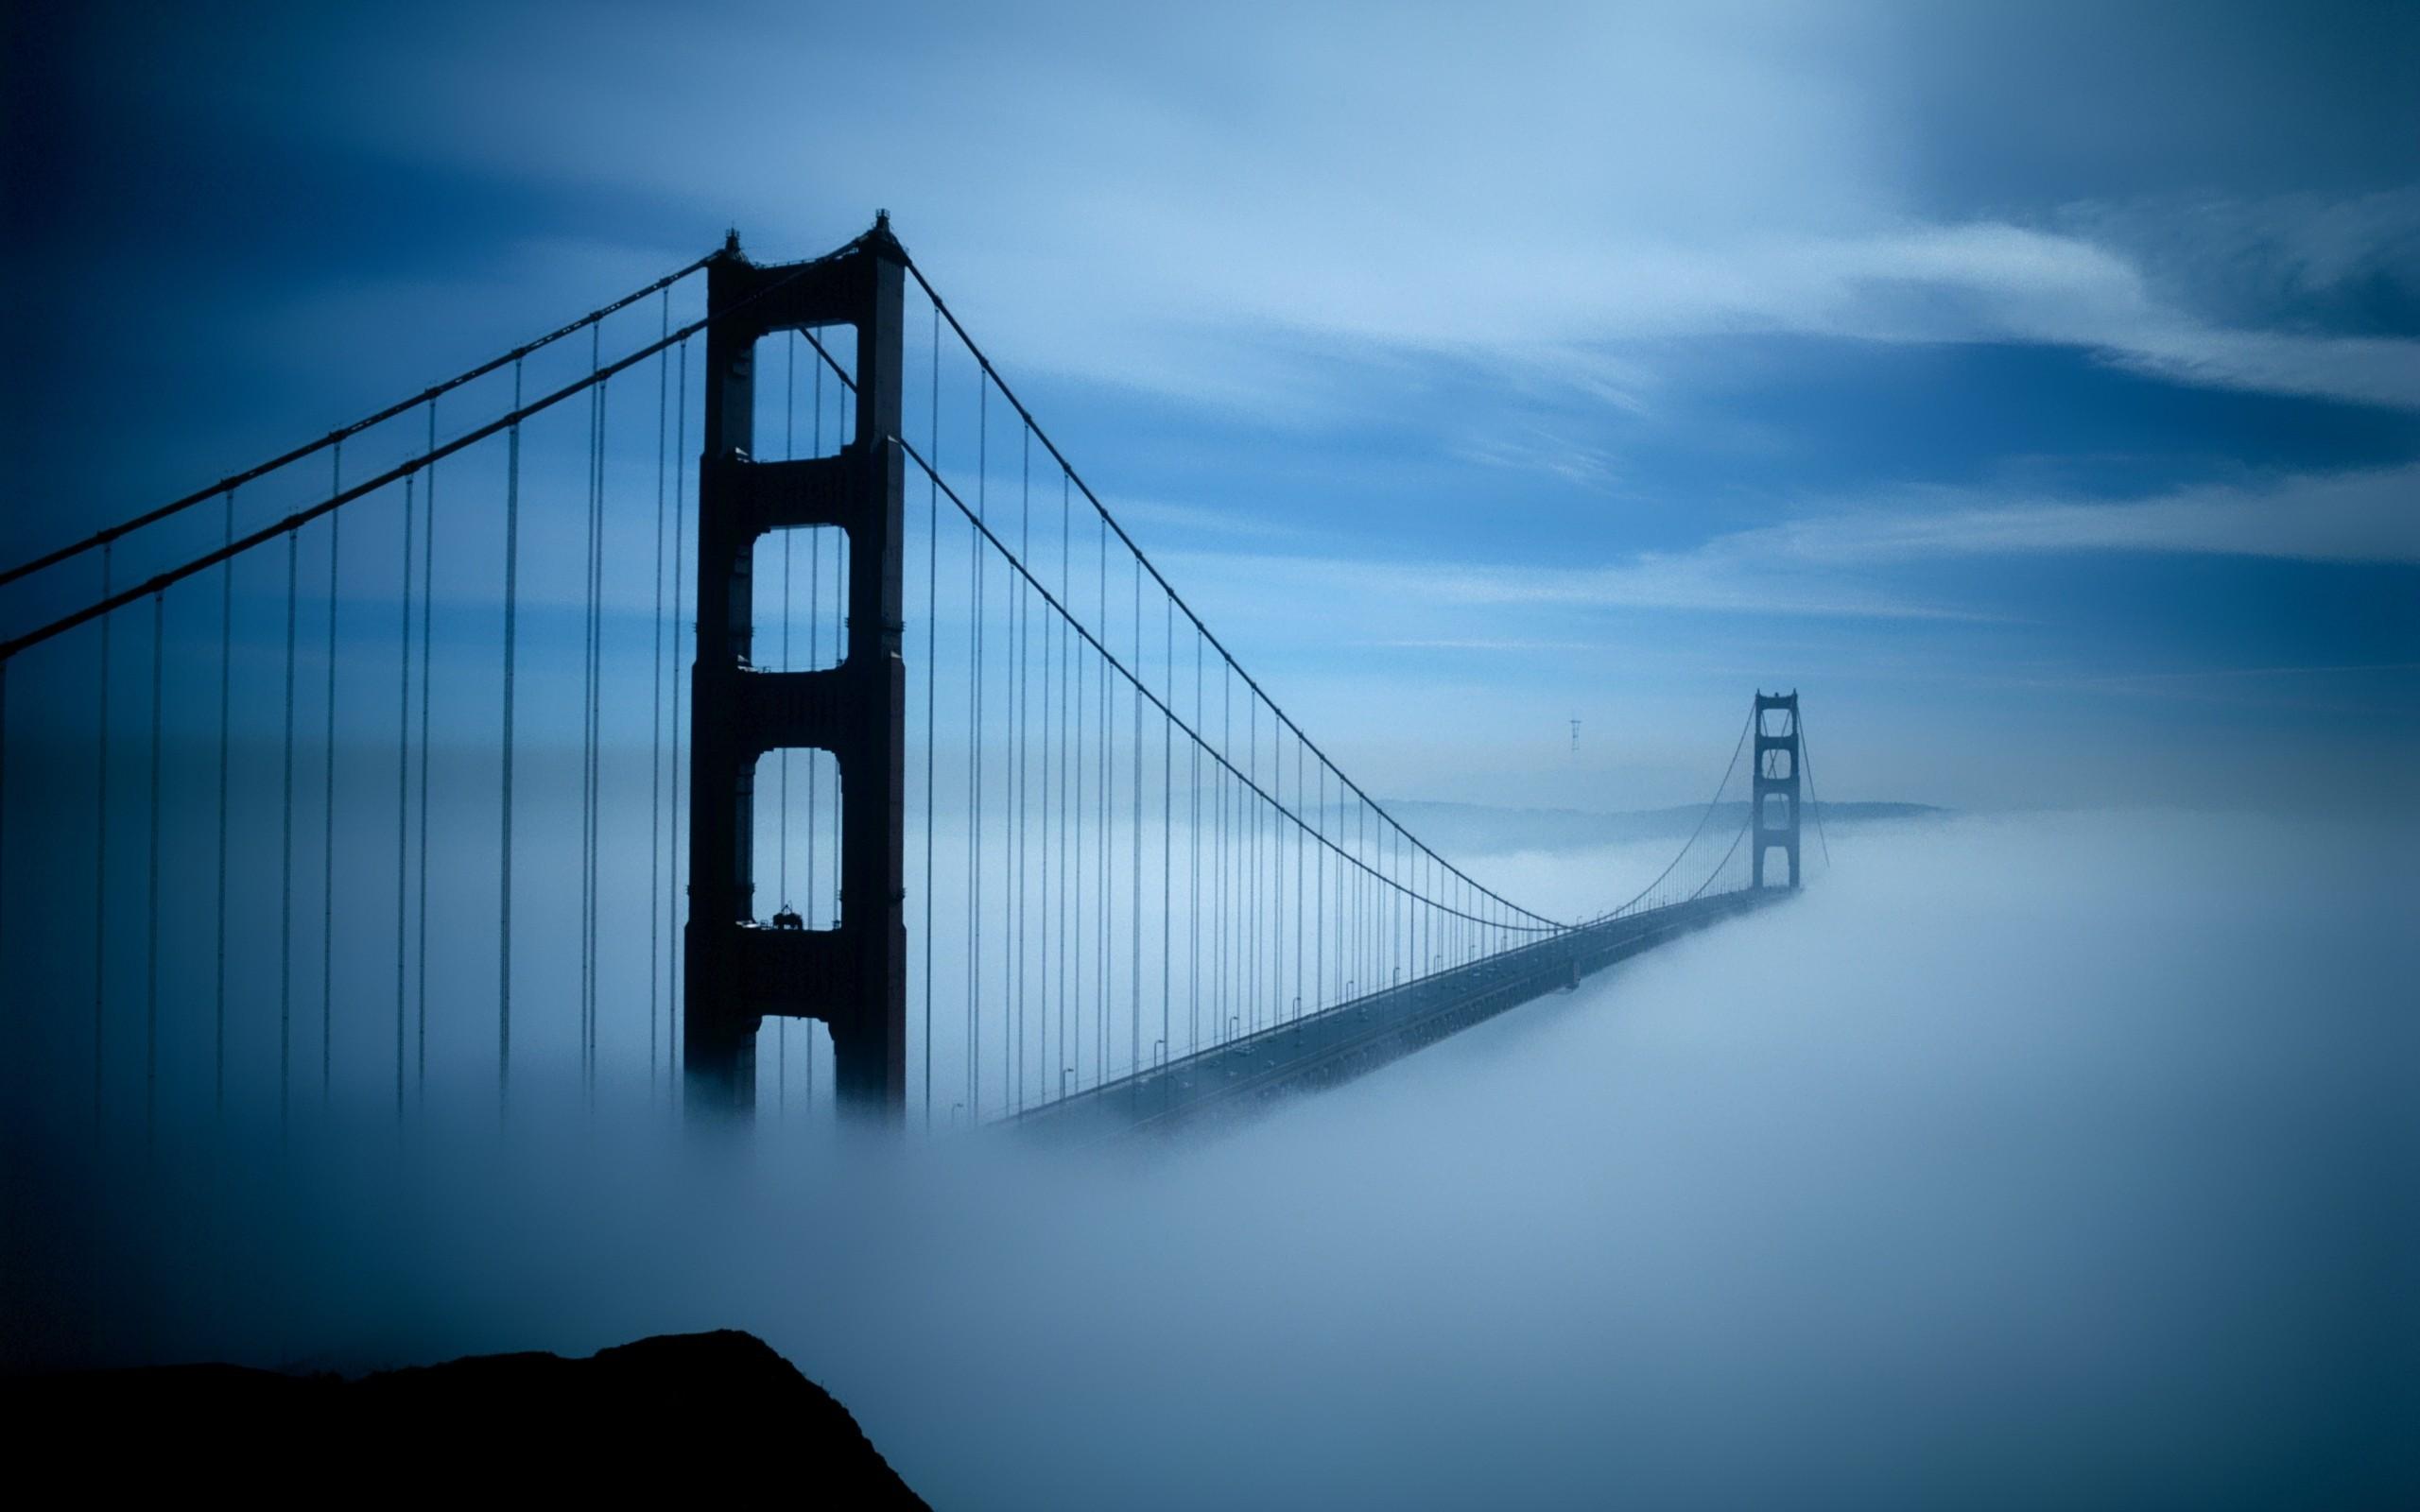 Golden gate bridge san francisco hd world 4k wallpapers - Bridge wallpaper hd ...